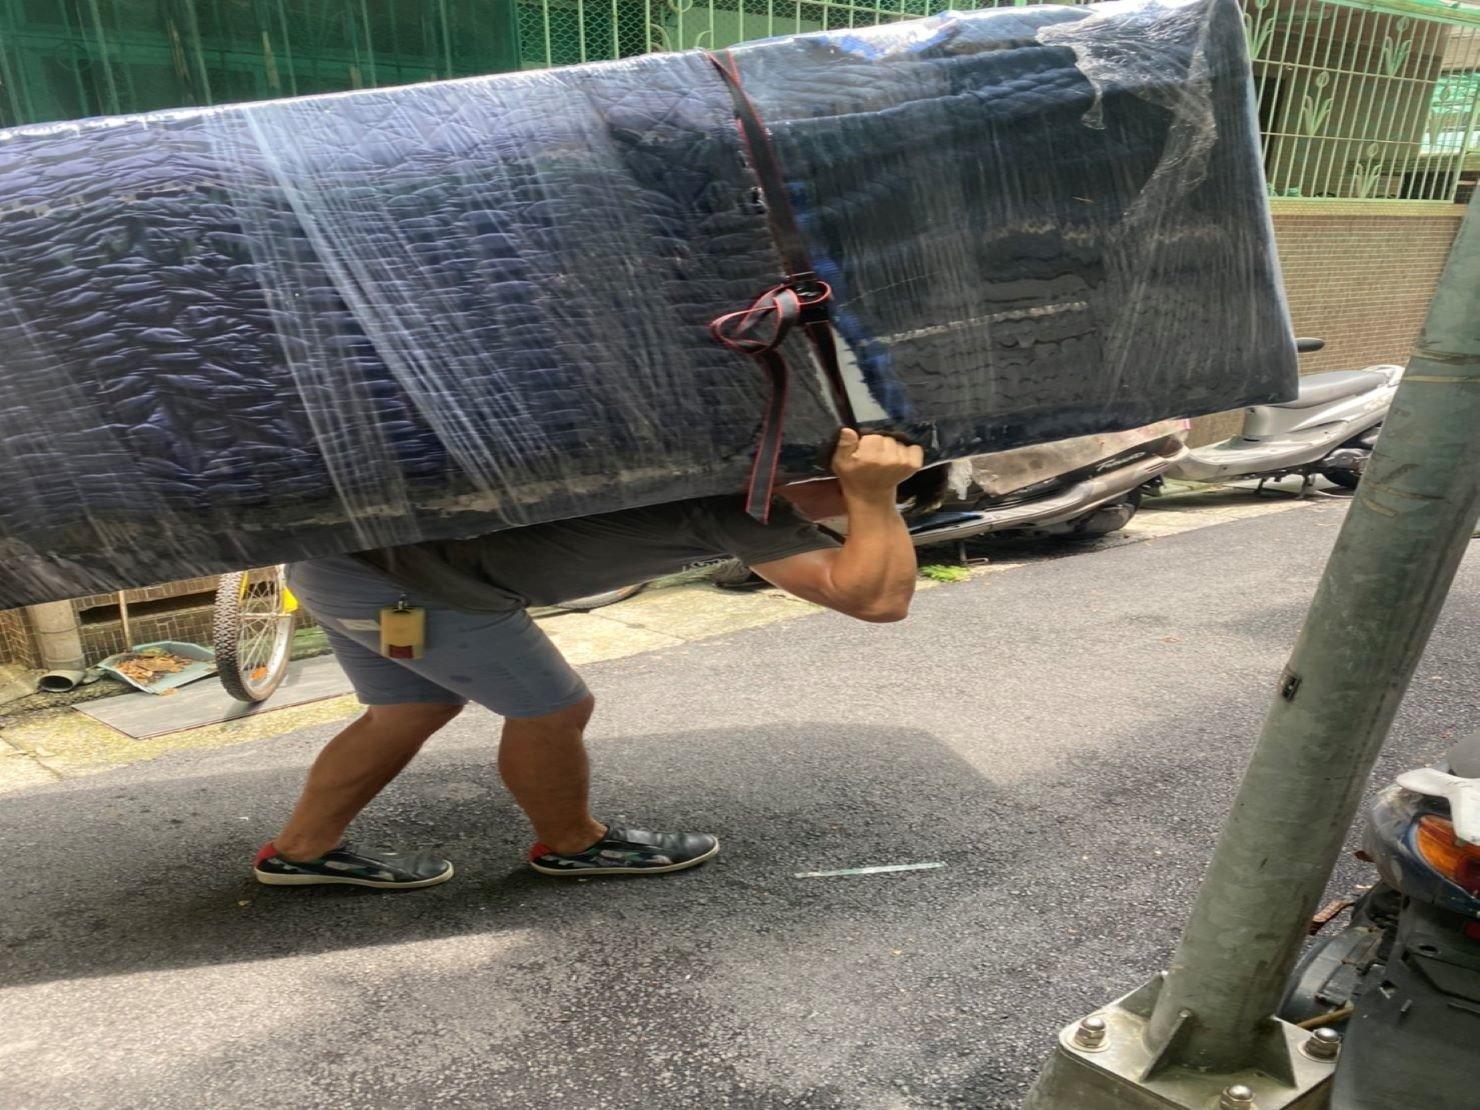 HITACHI大型冰箱搬運下樓-搬家公司推薦【榮福搬家】南港搬家公司,走巷弄需背搬運送至貨車上